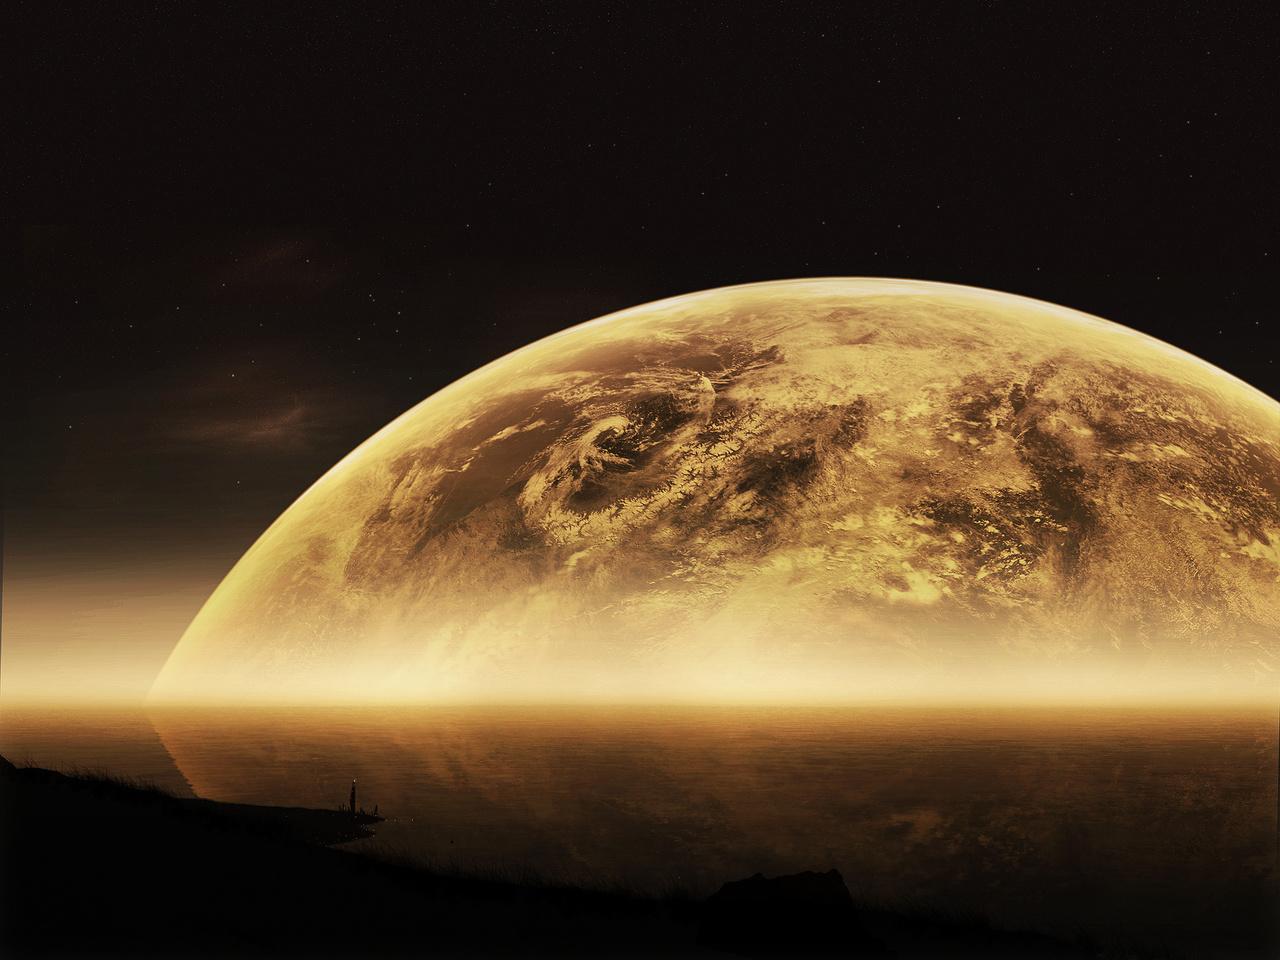 edged, big, sci fi, Planets, moon